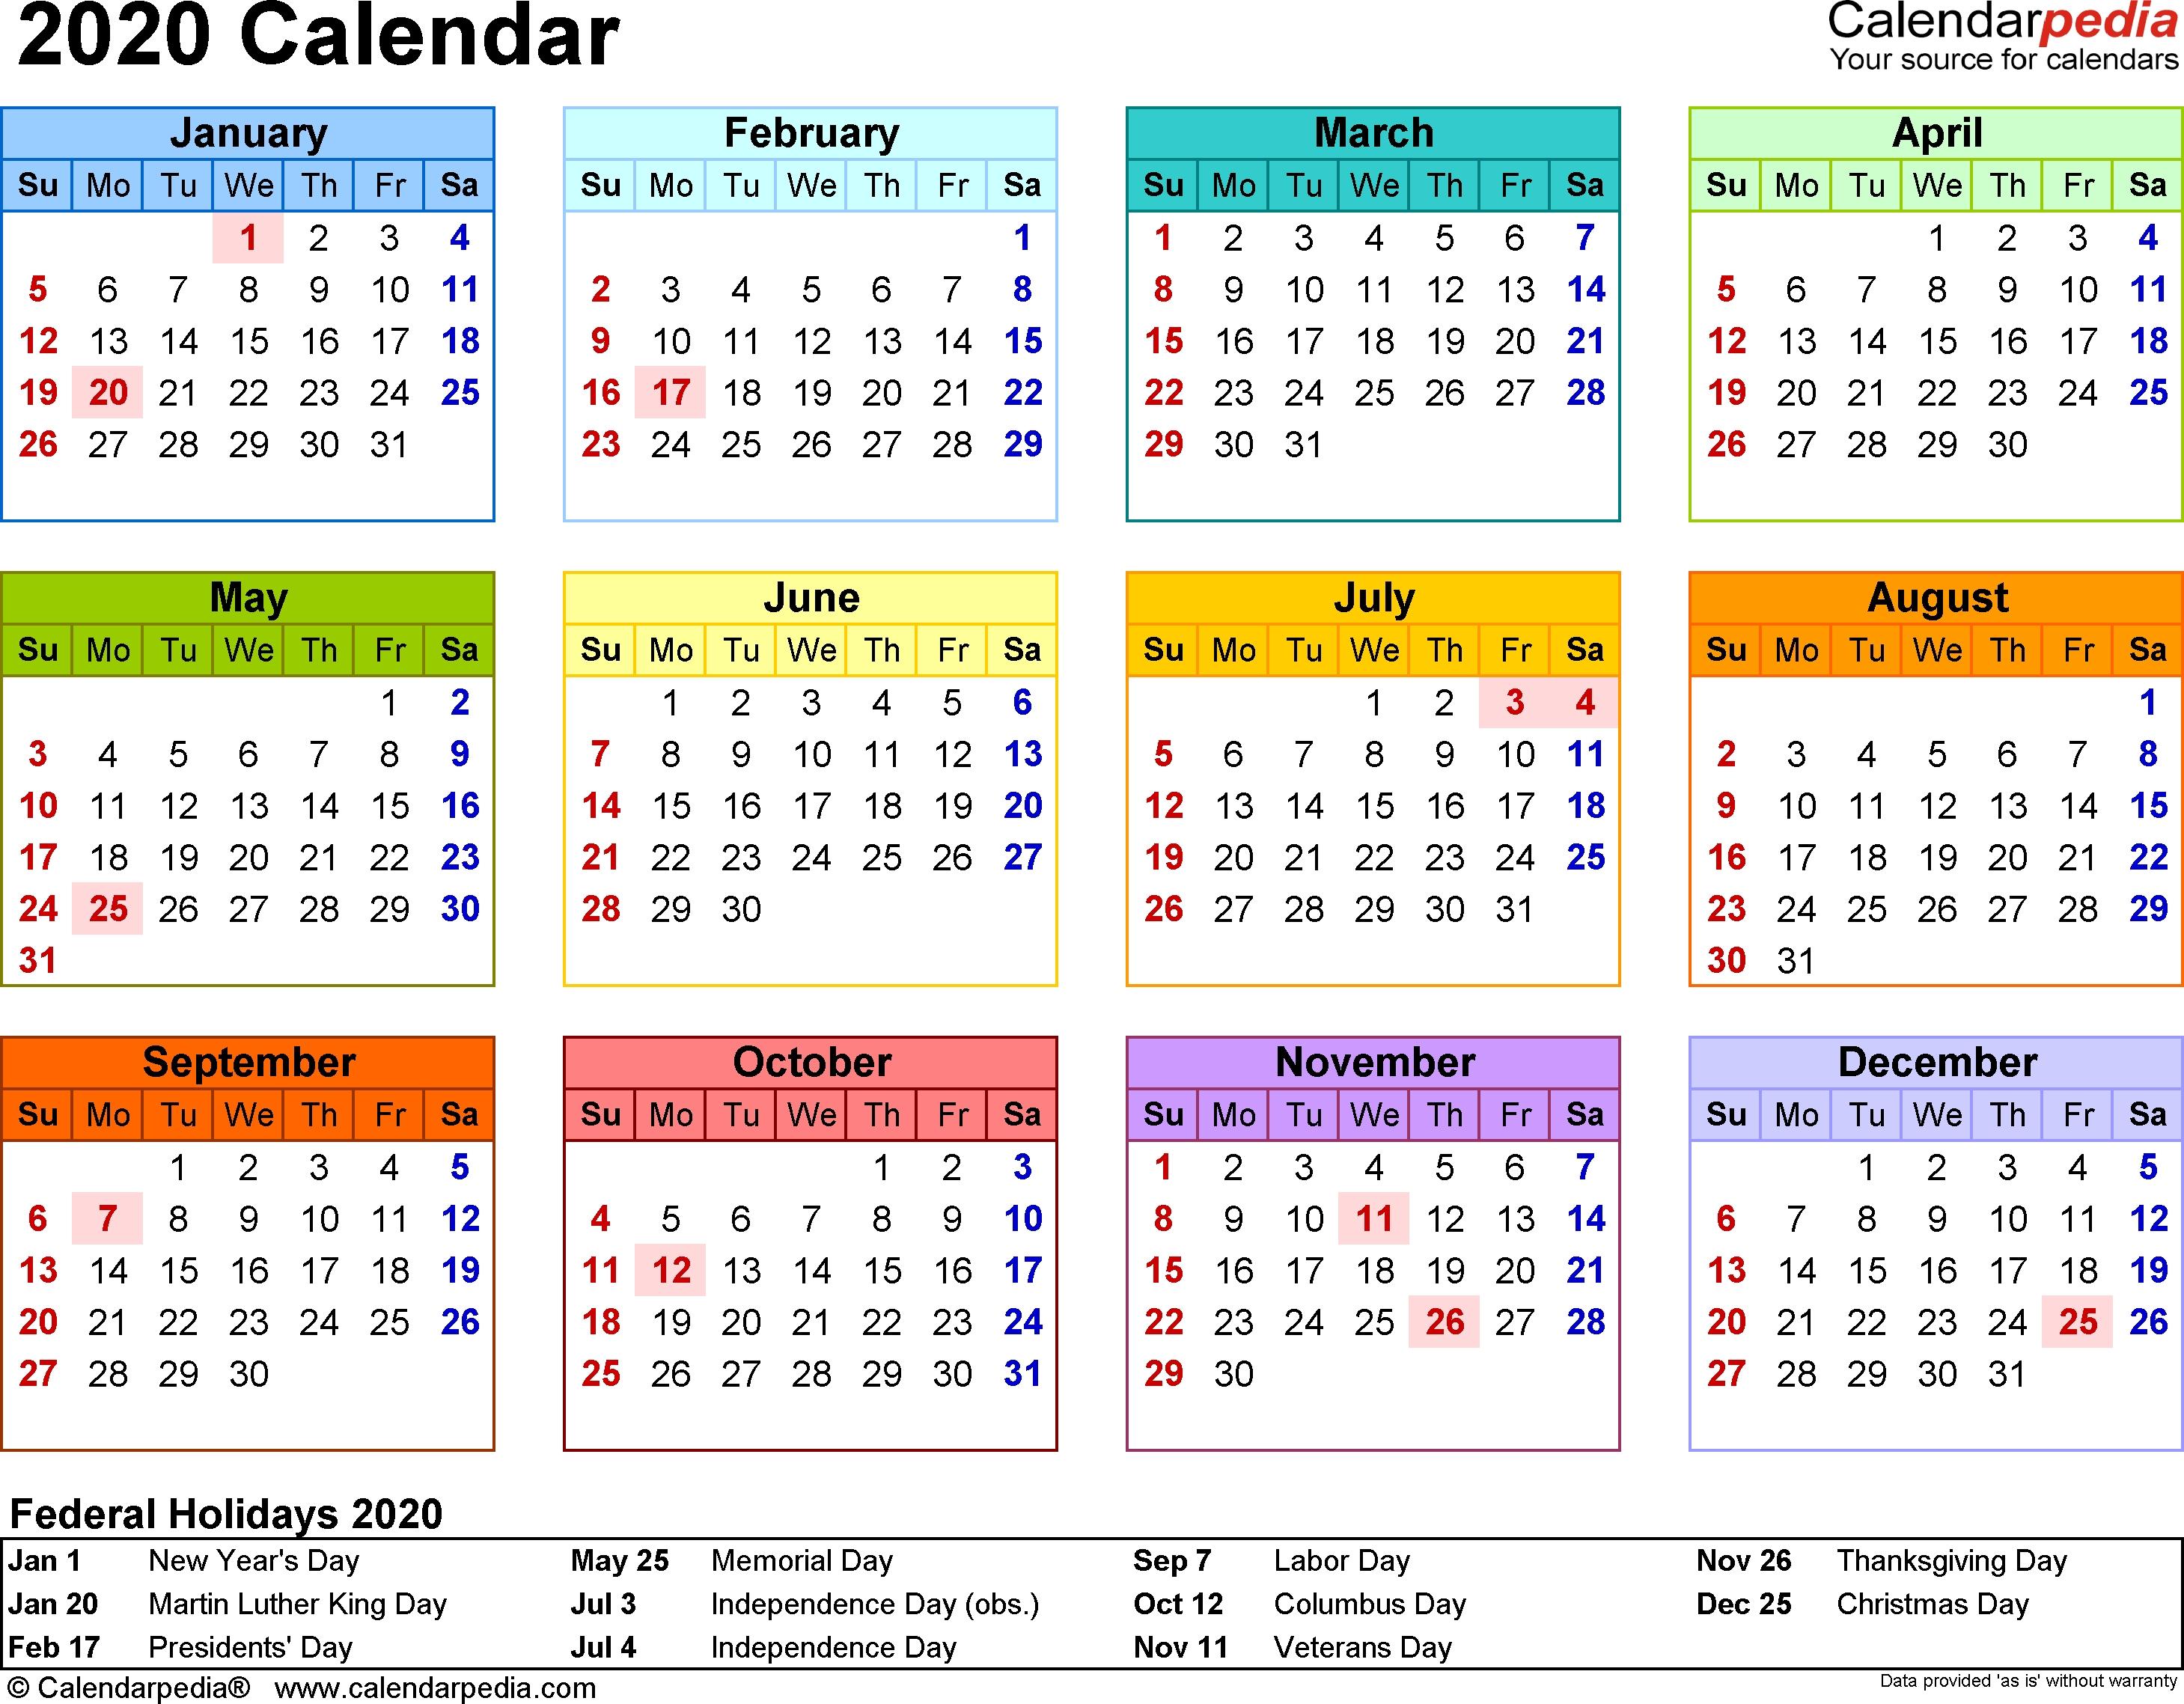 2020 Calendar - Free Printable Microsoft Word Templates in Year At A Glance Calendar 2020 Free